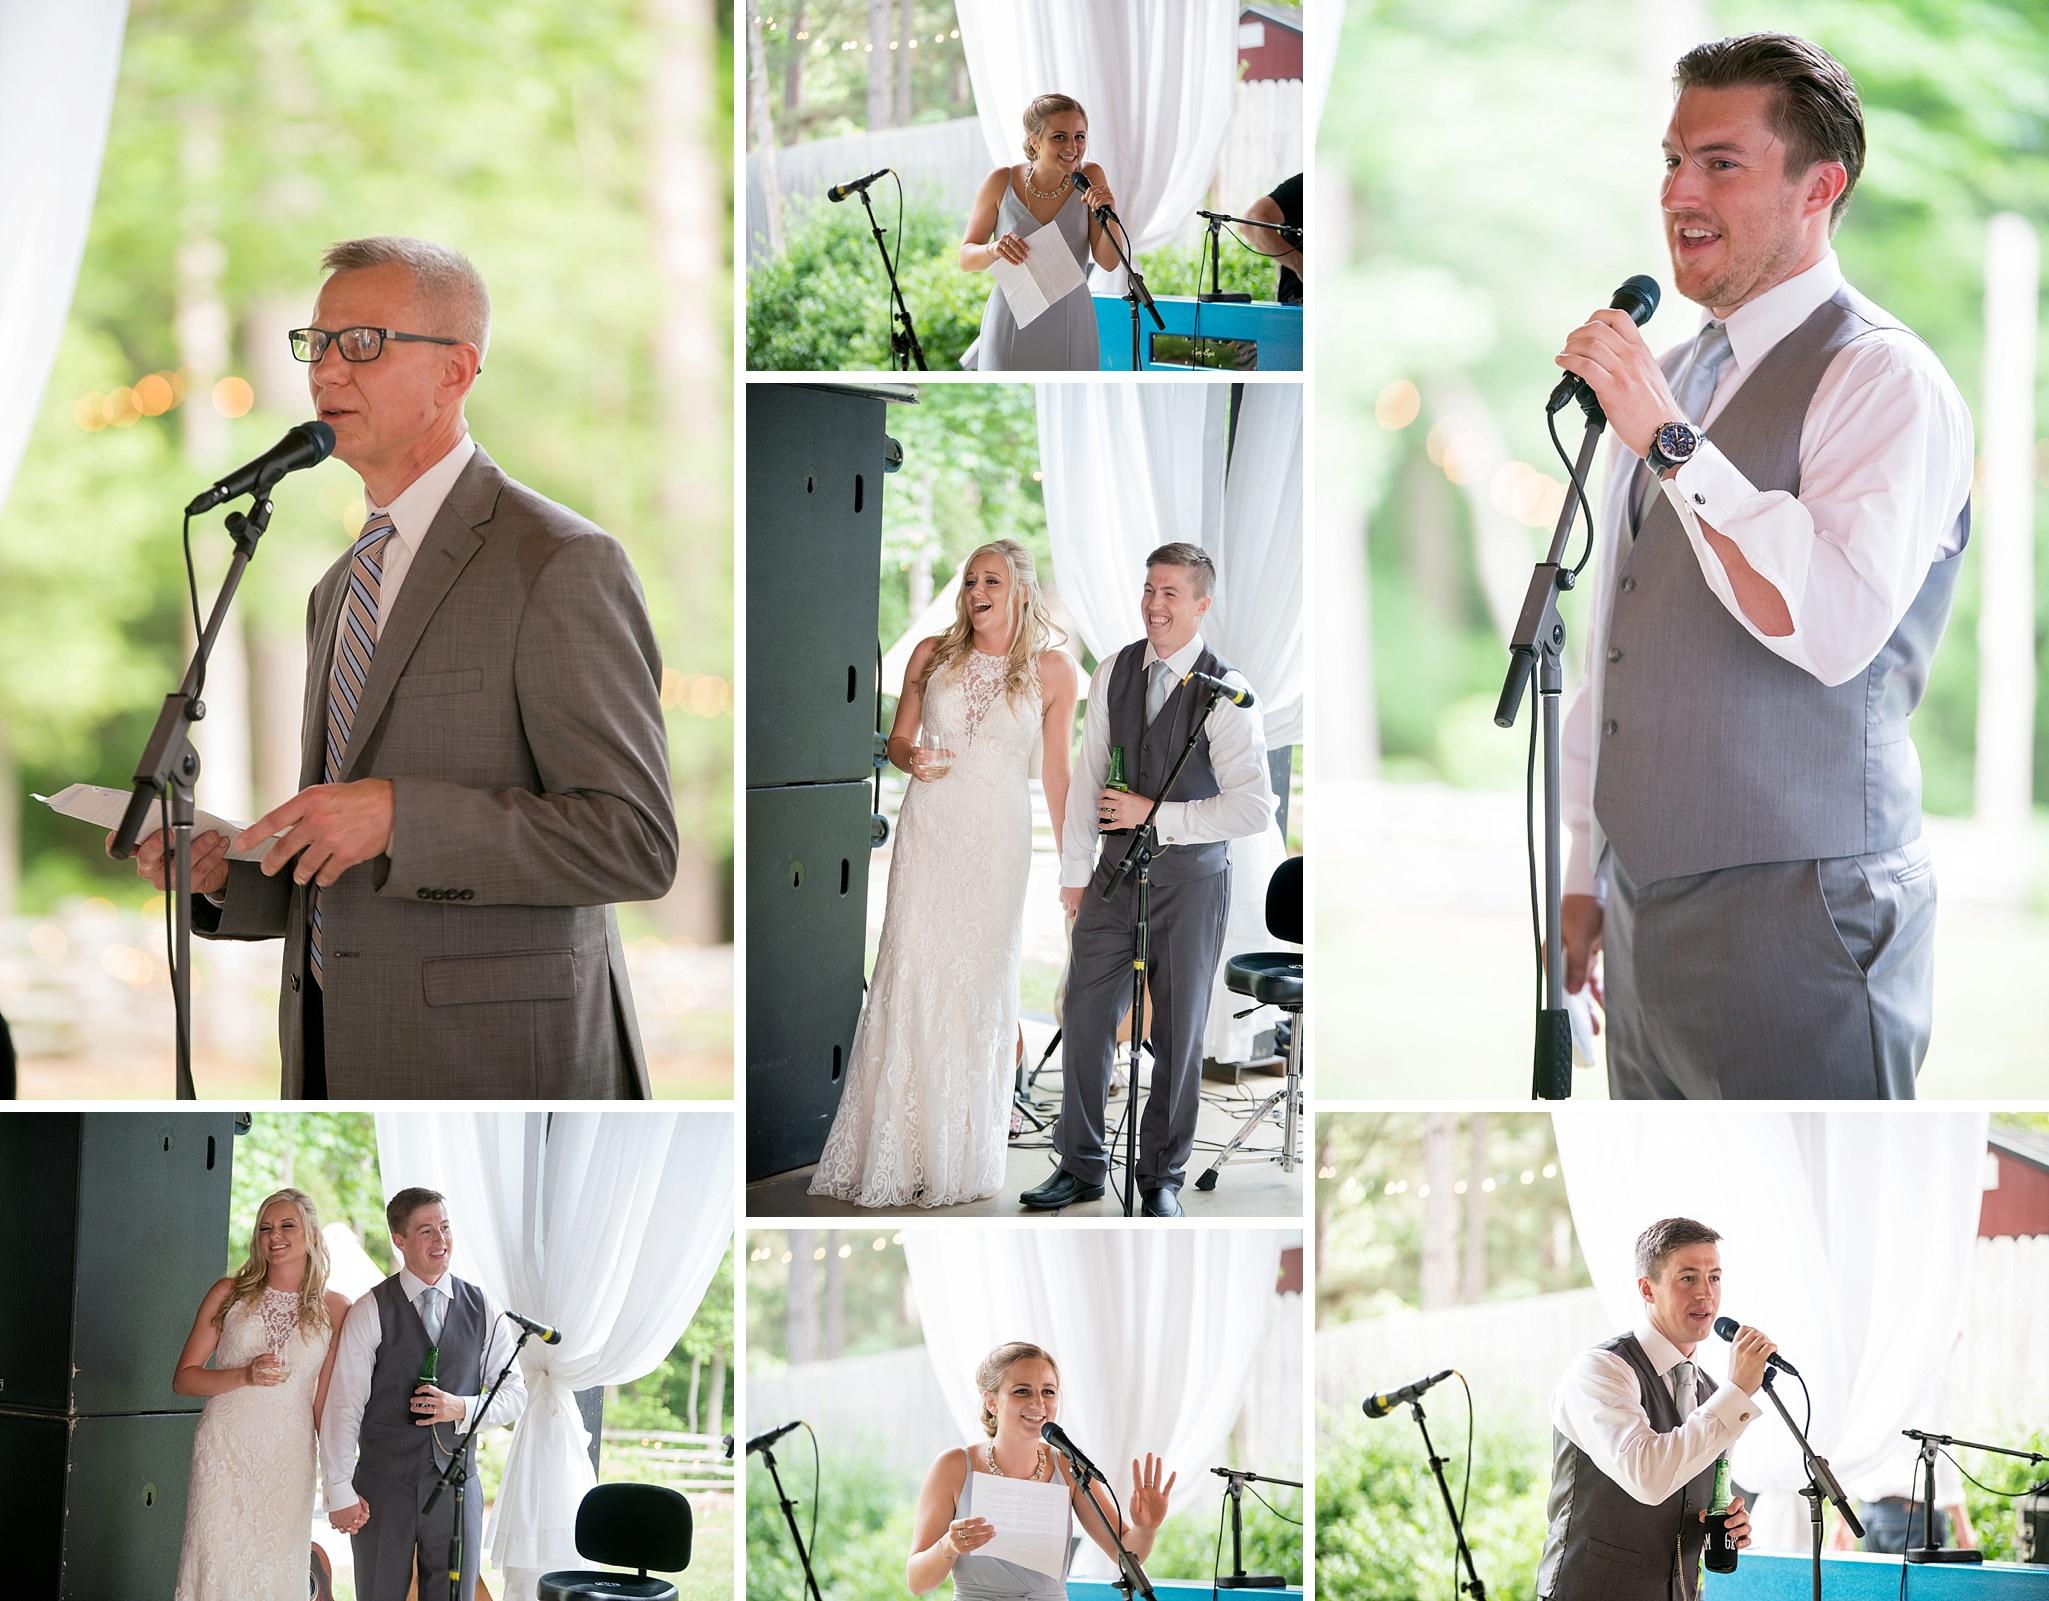 Shady-Wagon-Farm-NC-Wedding-Photographer-0182.jpg